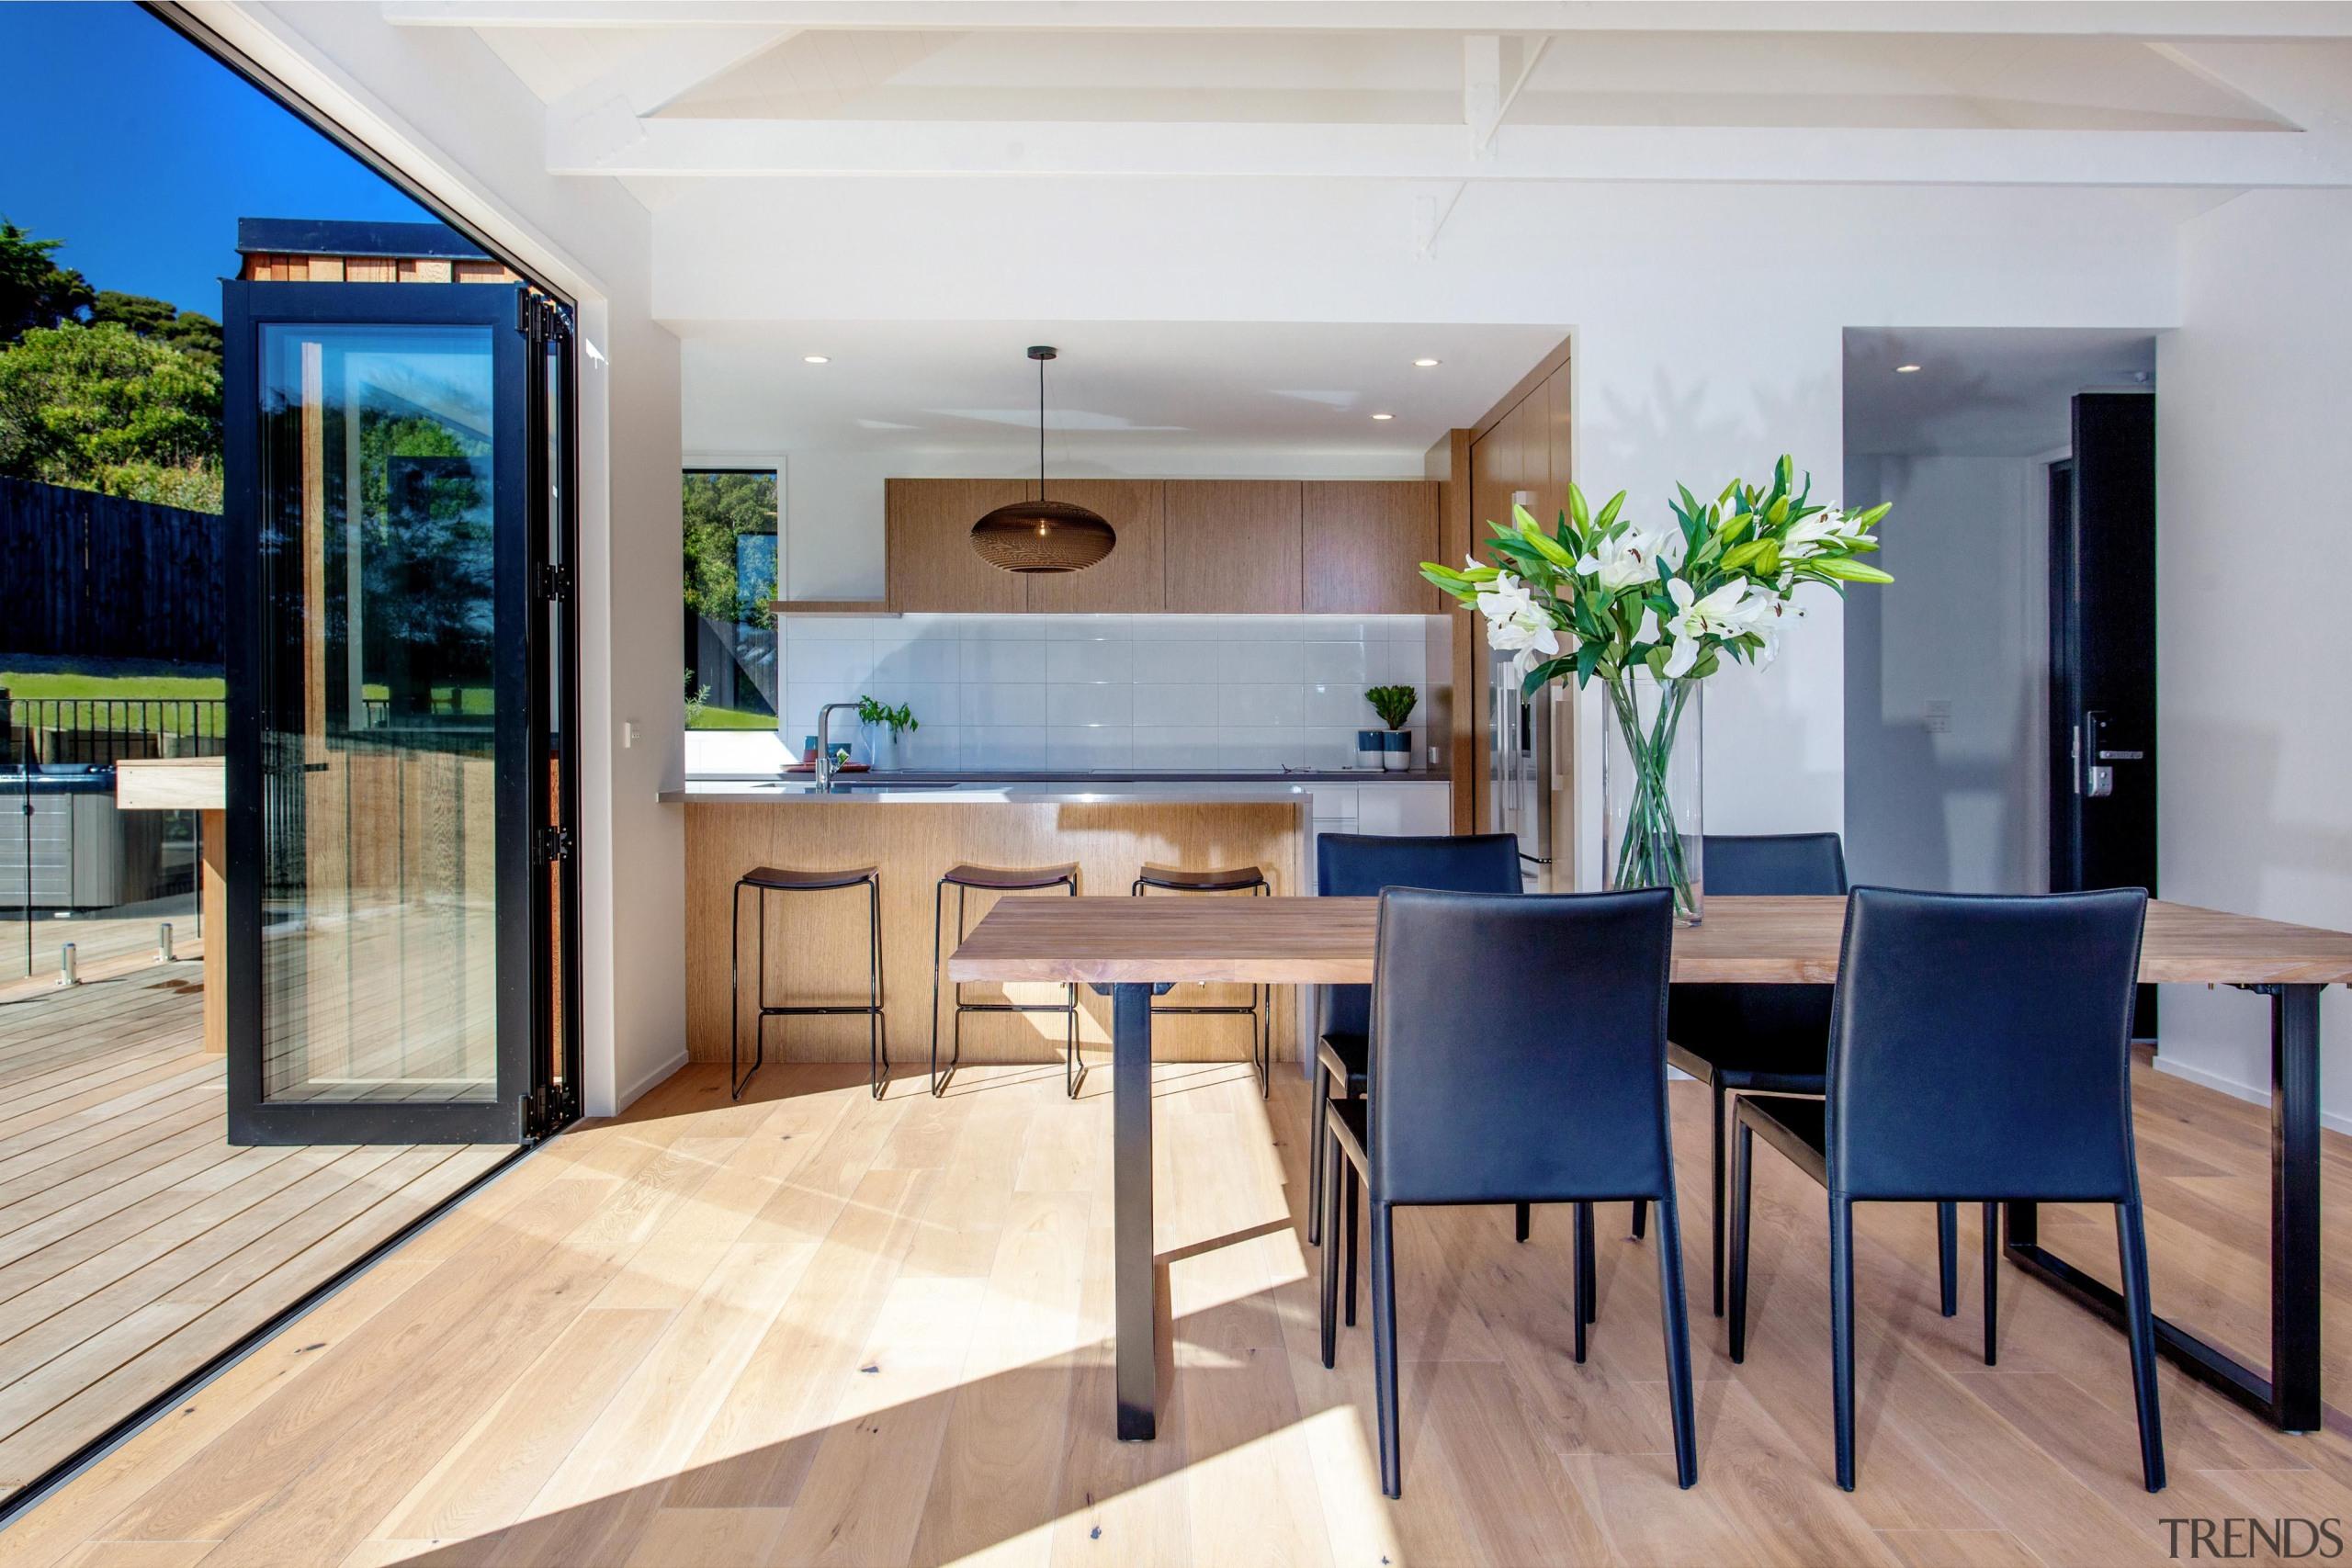 c151.jpg - floor | house | interior design floor, house, interior design, real estate, table, gray, white